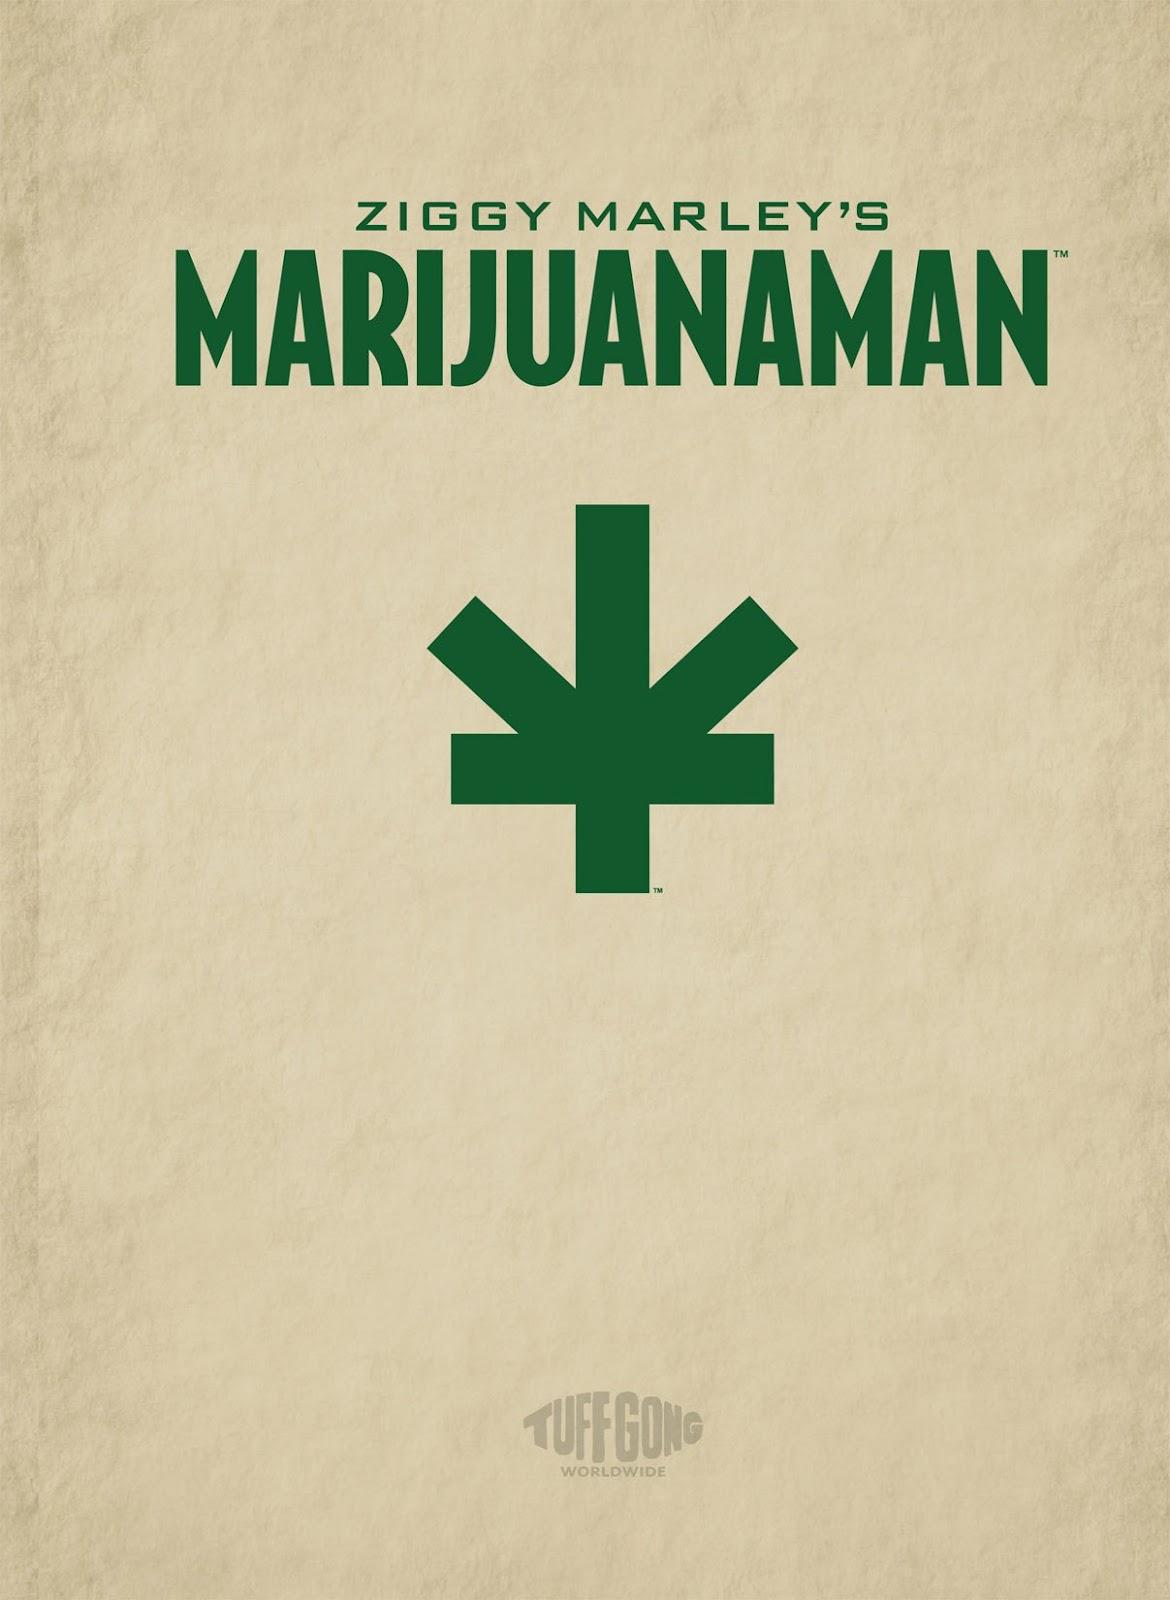 Read online Marijuanaman comic -  Issue # Full - 2